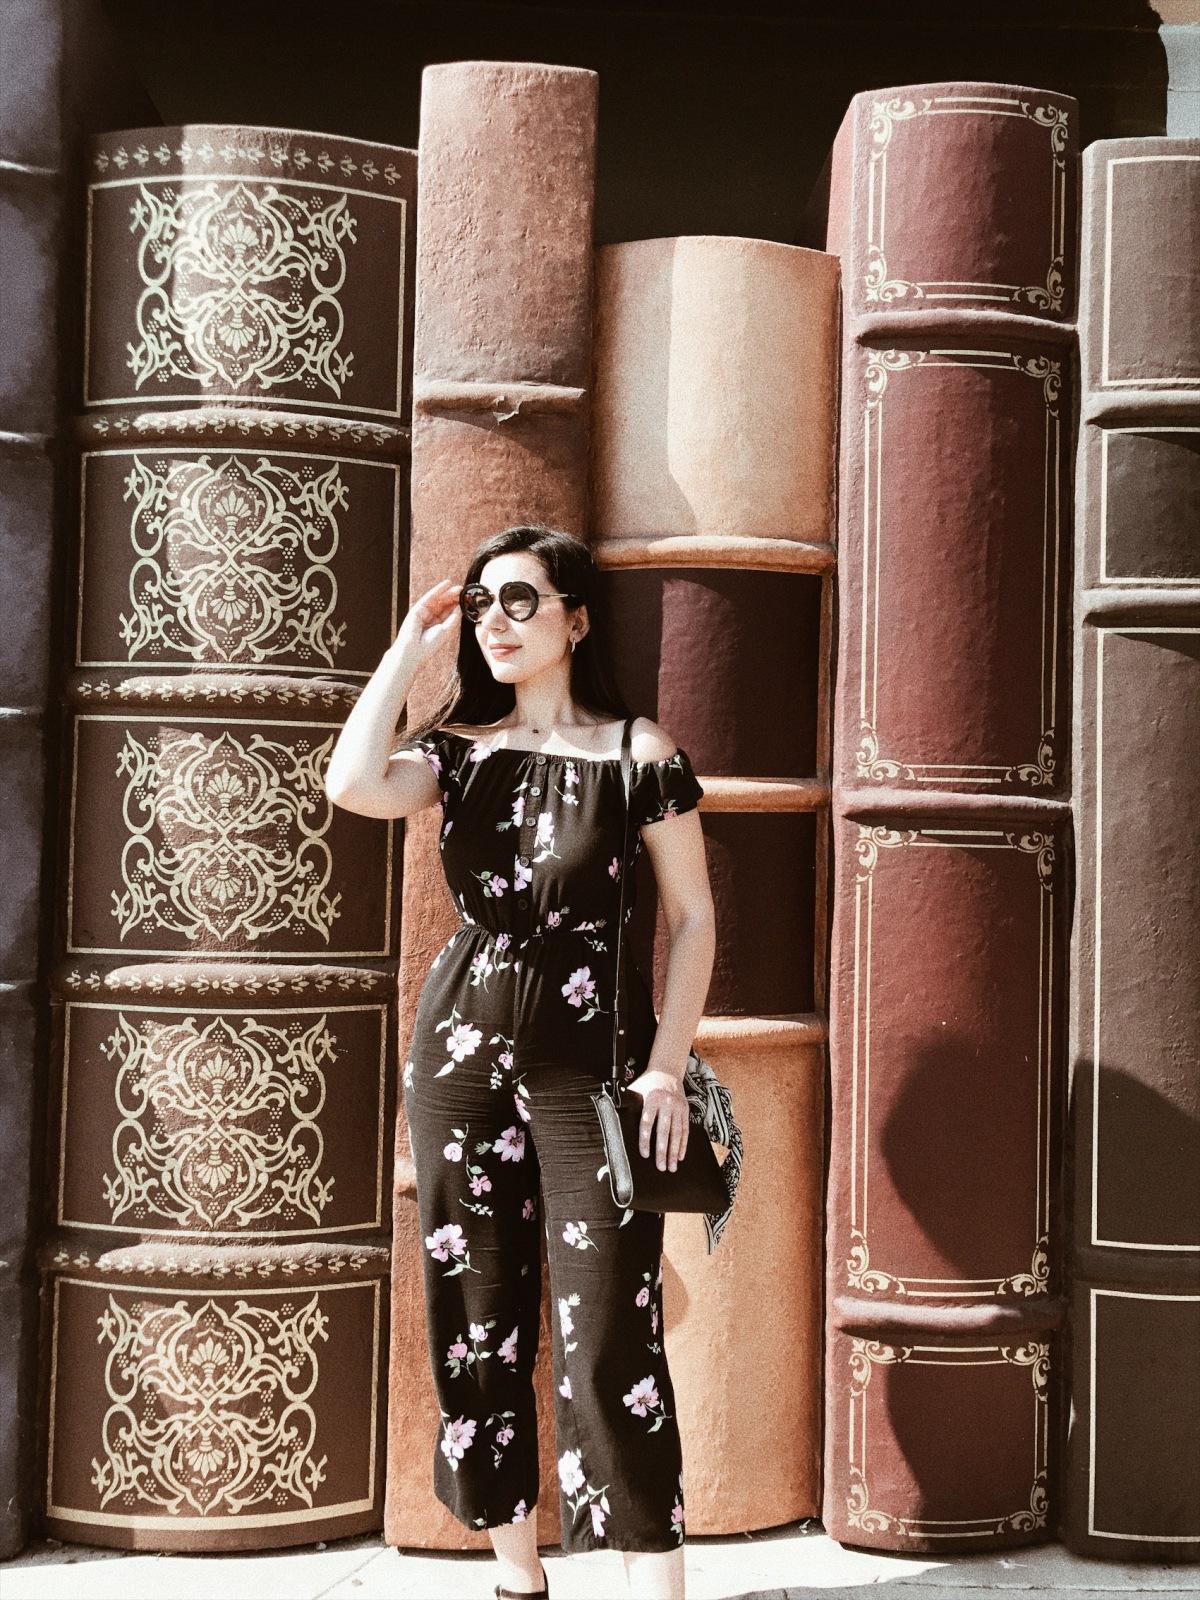 Iliad Bookshop, bookish, Los Angeles bookshop, Burbank book shop, Burbank, fashion blogger, style blogger, book blogger, floral jumpsuit, Prada Sunglasses